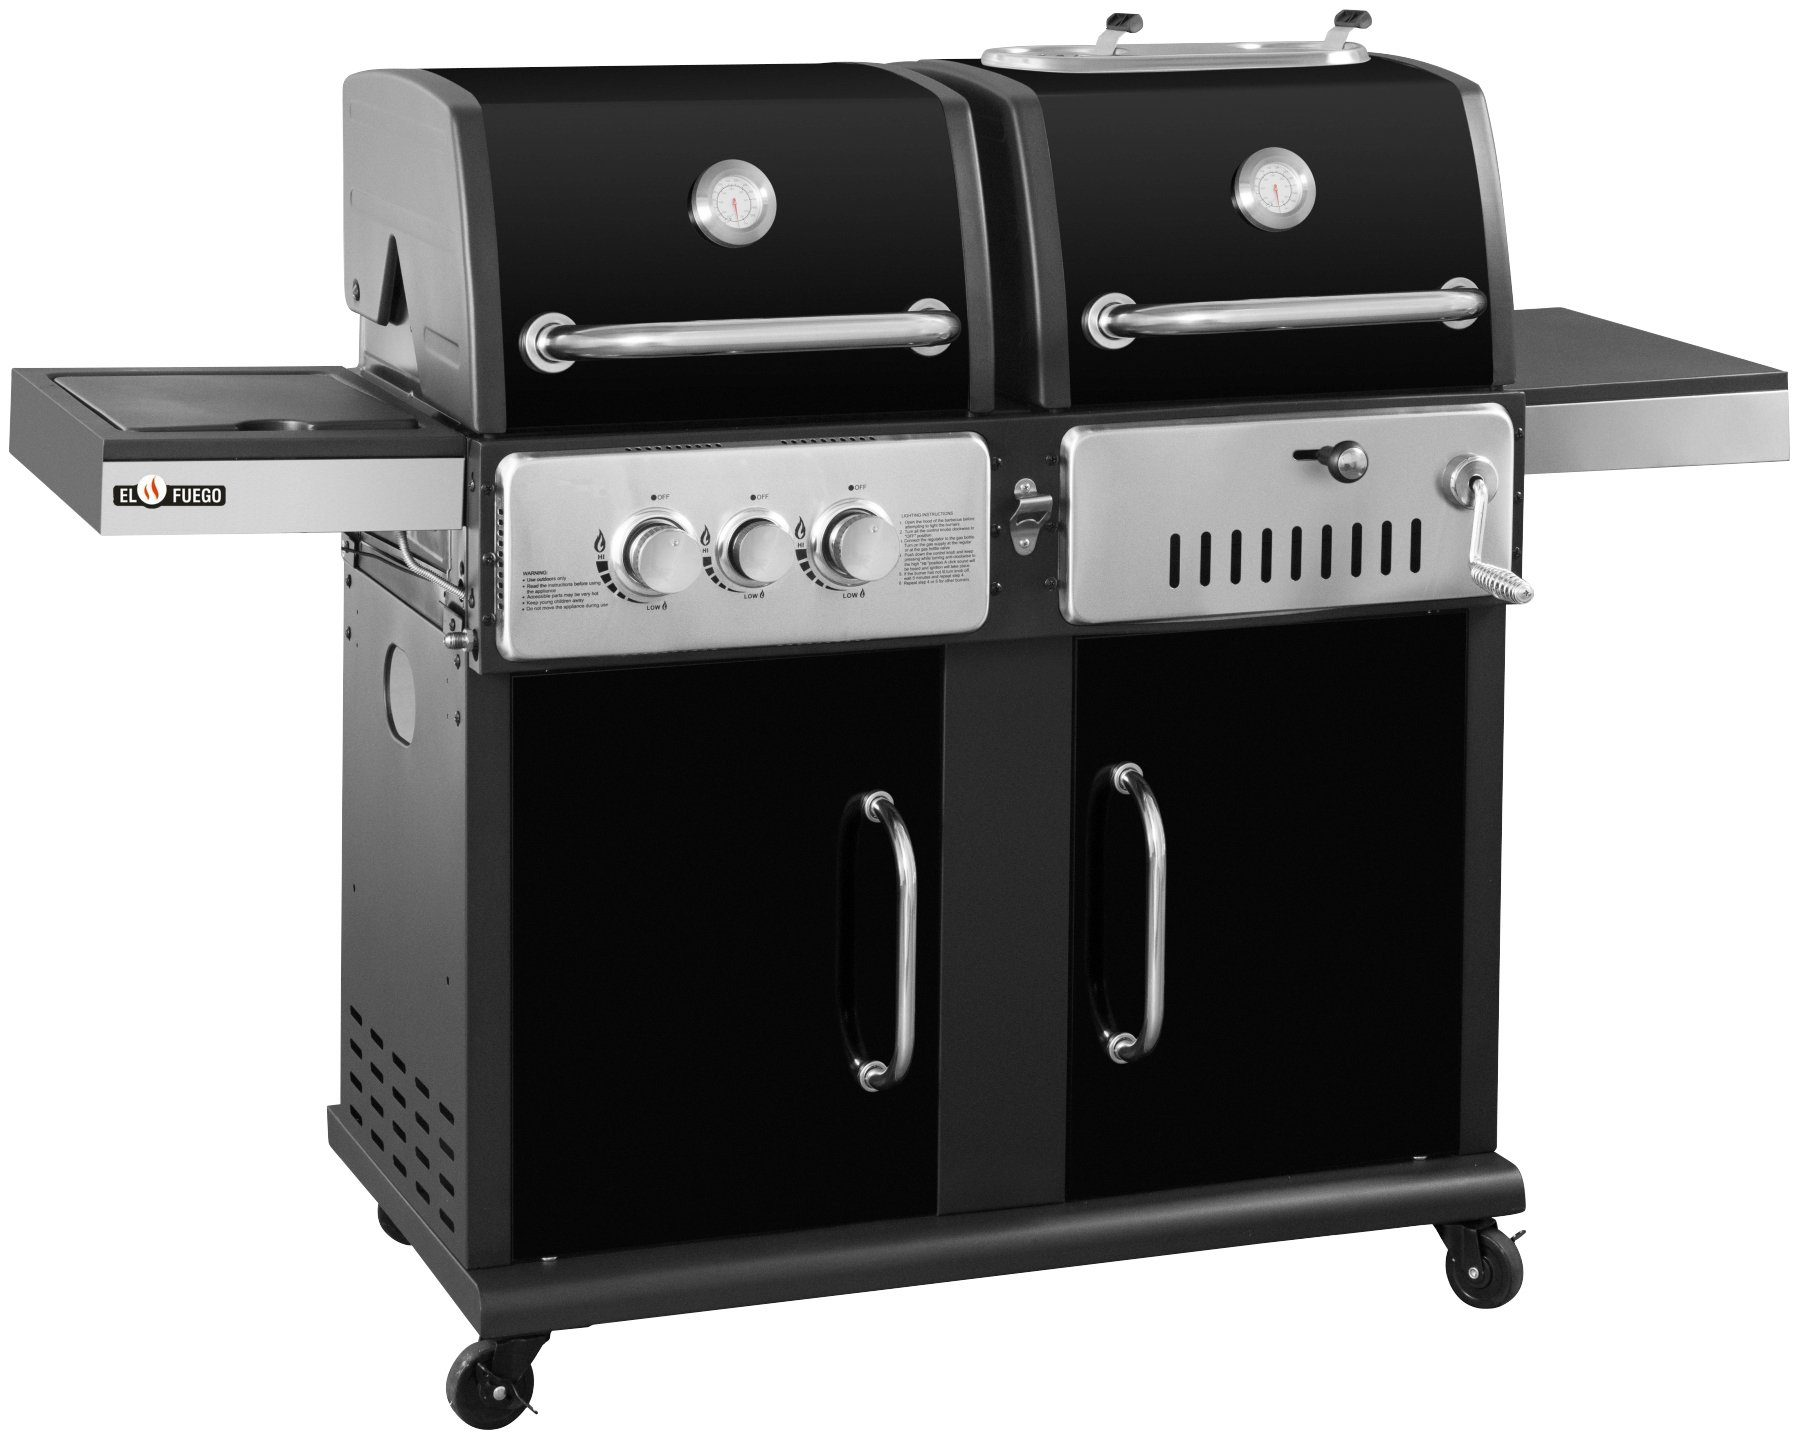 Enders Gasgrill Manhattan : Enders grills günstig kaufen ebay